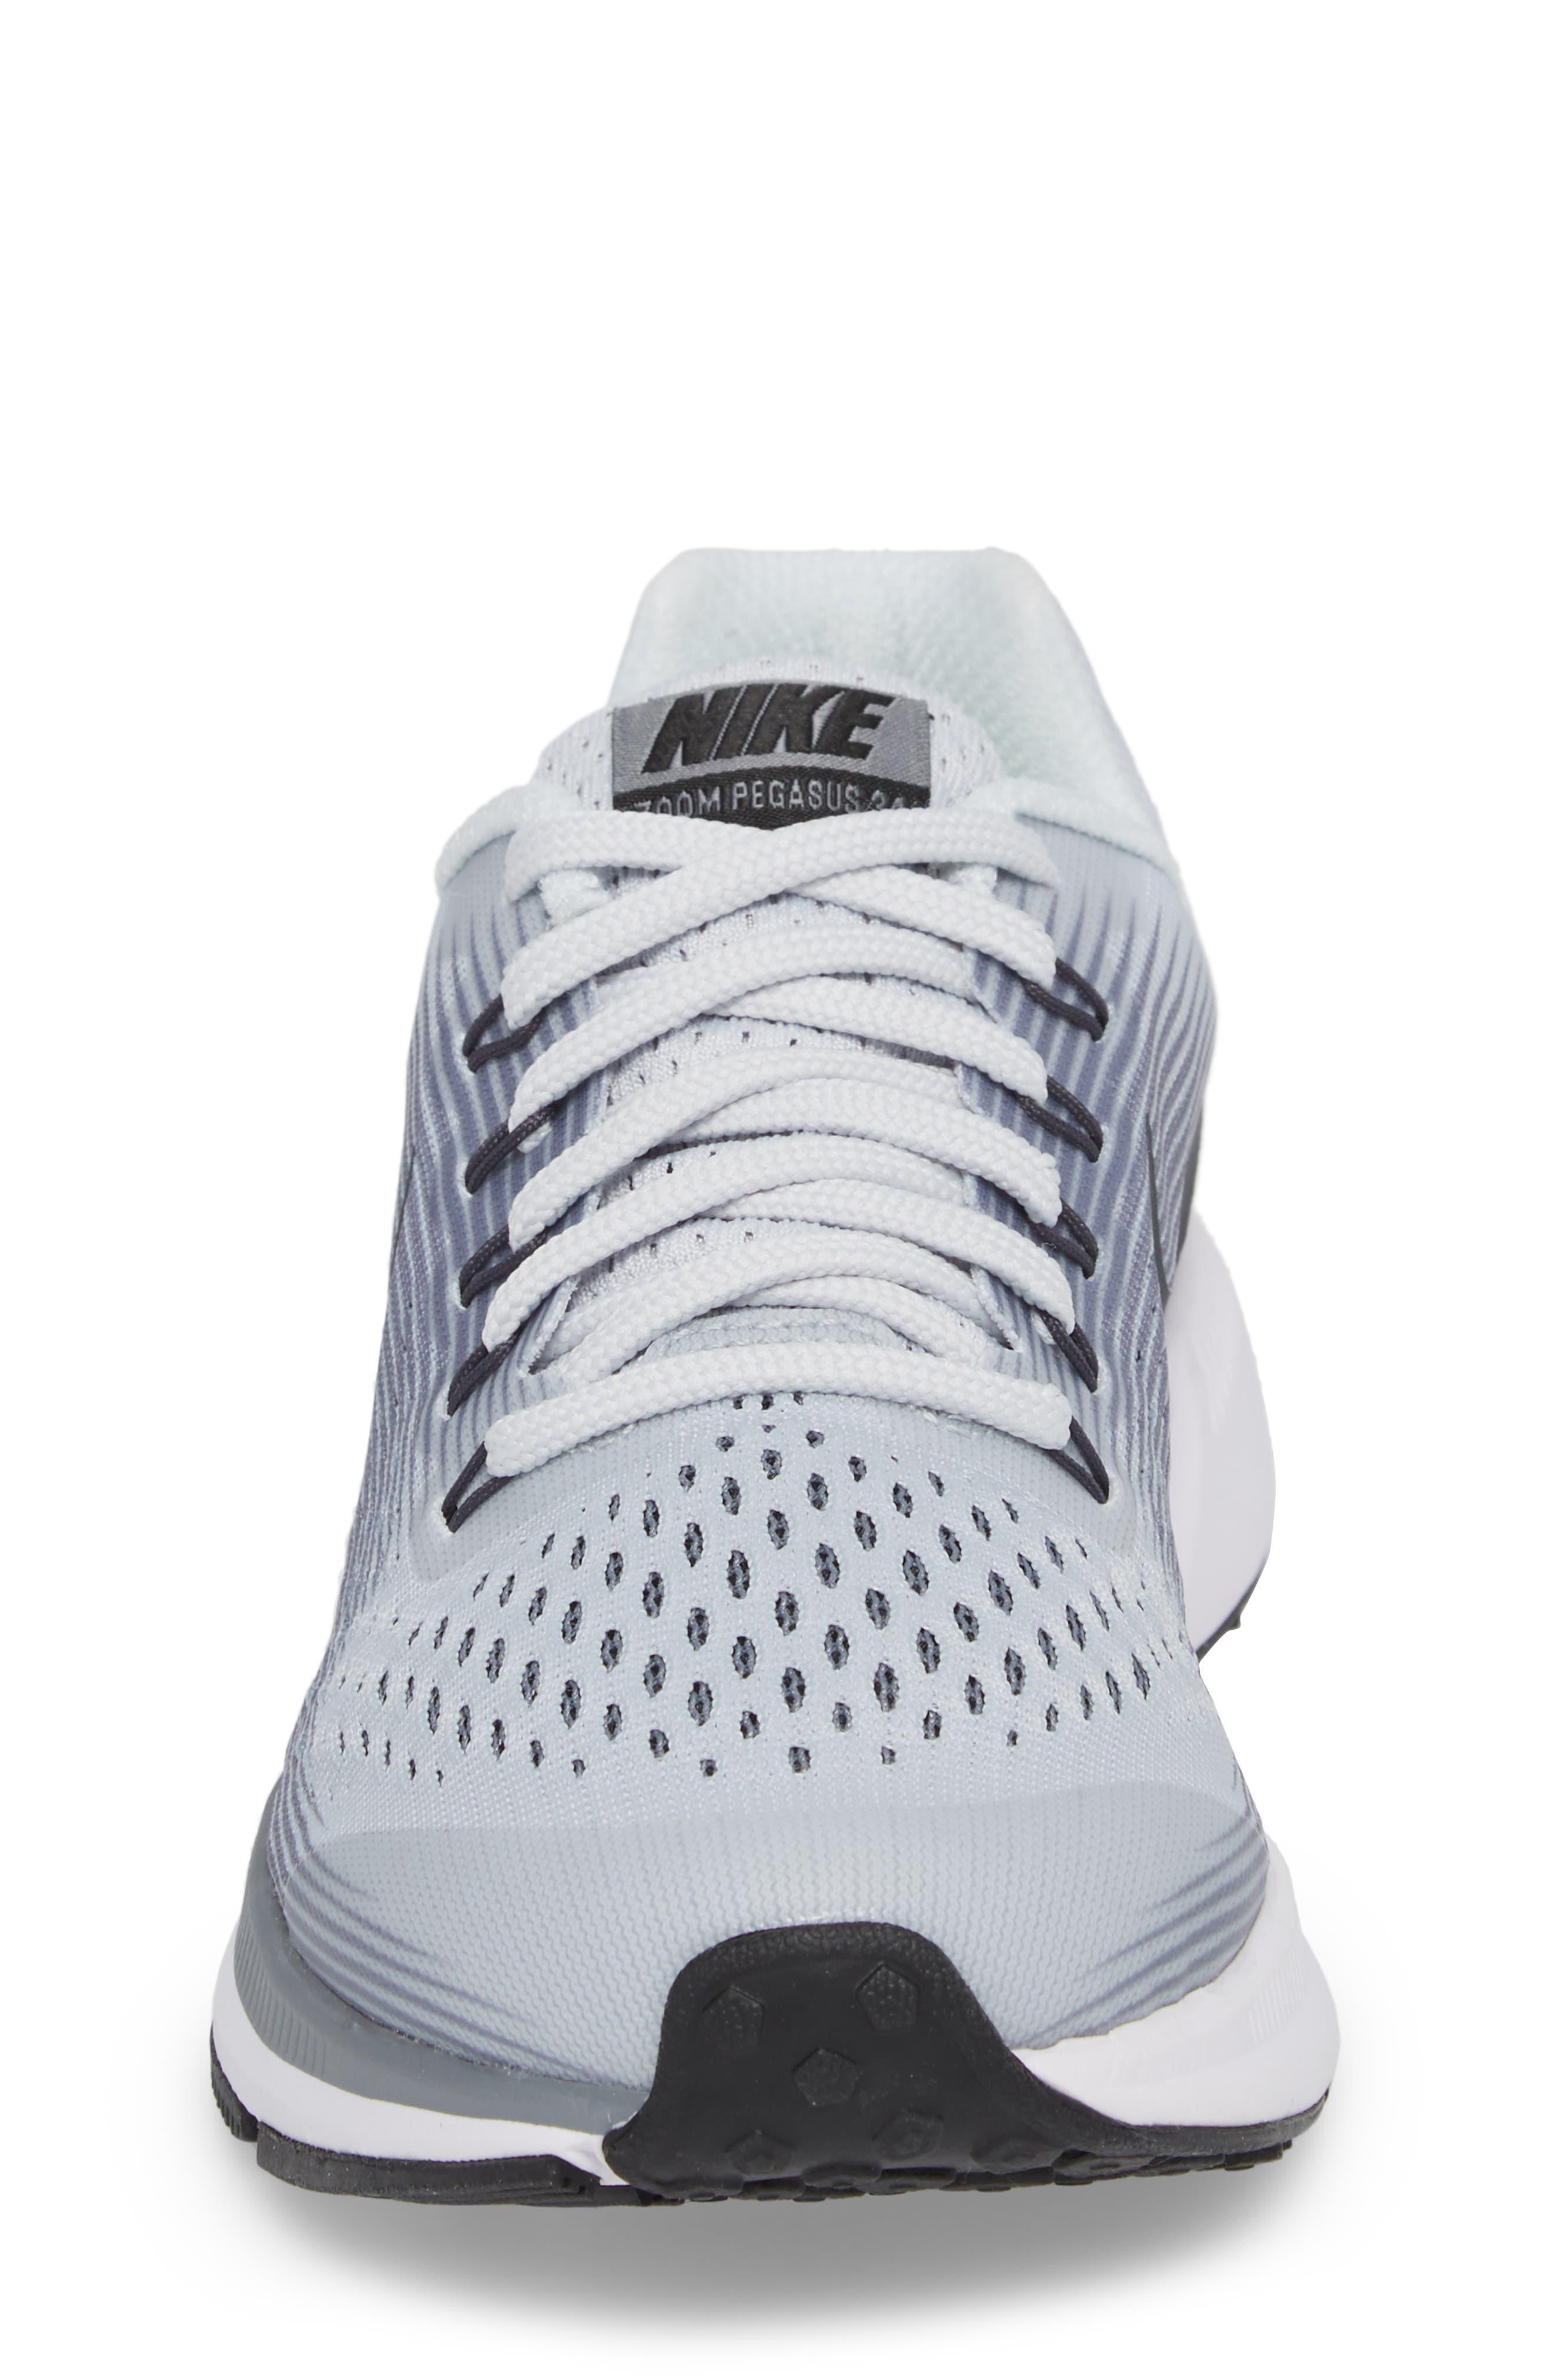 Zoom Pegasus 34 Sneaker,                             Alternate thumbnail 4, color,                             Platinum/ Anthracite/ Grey